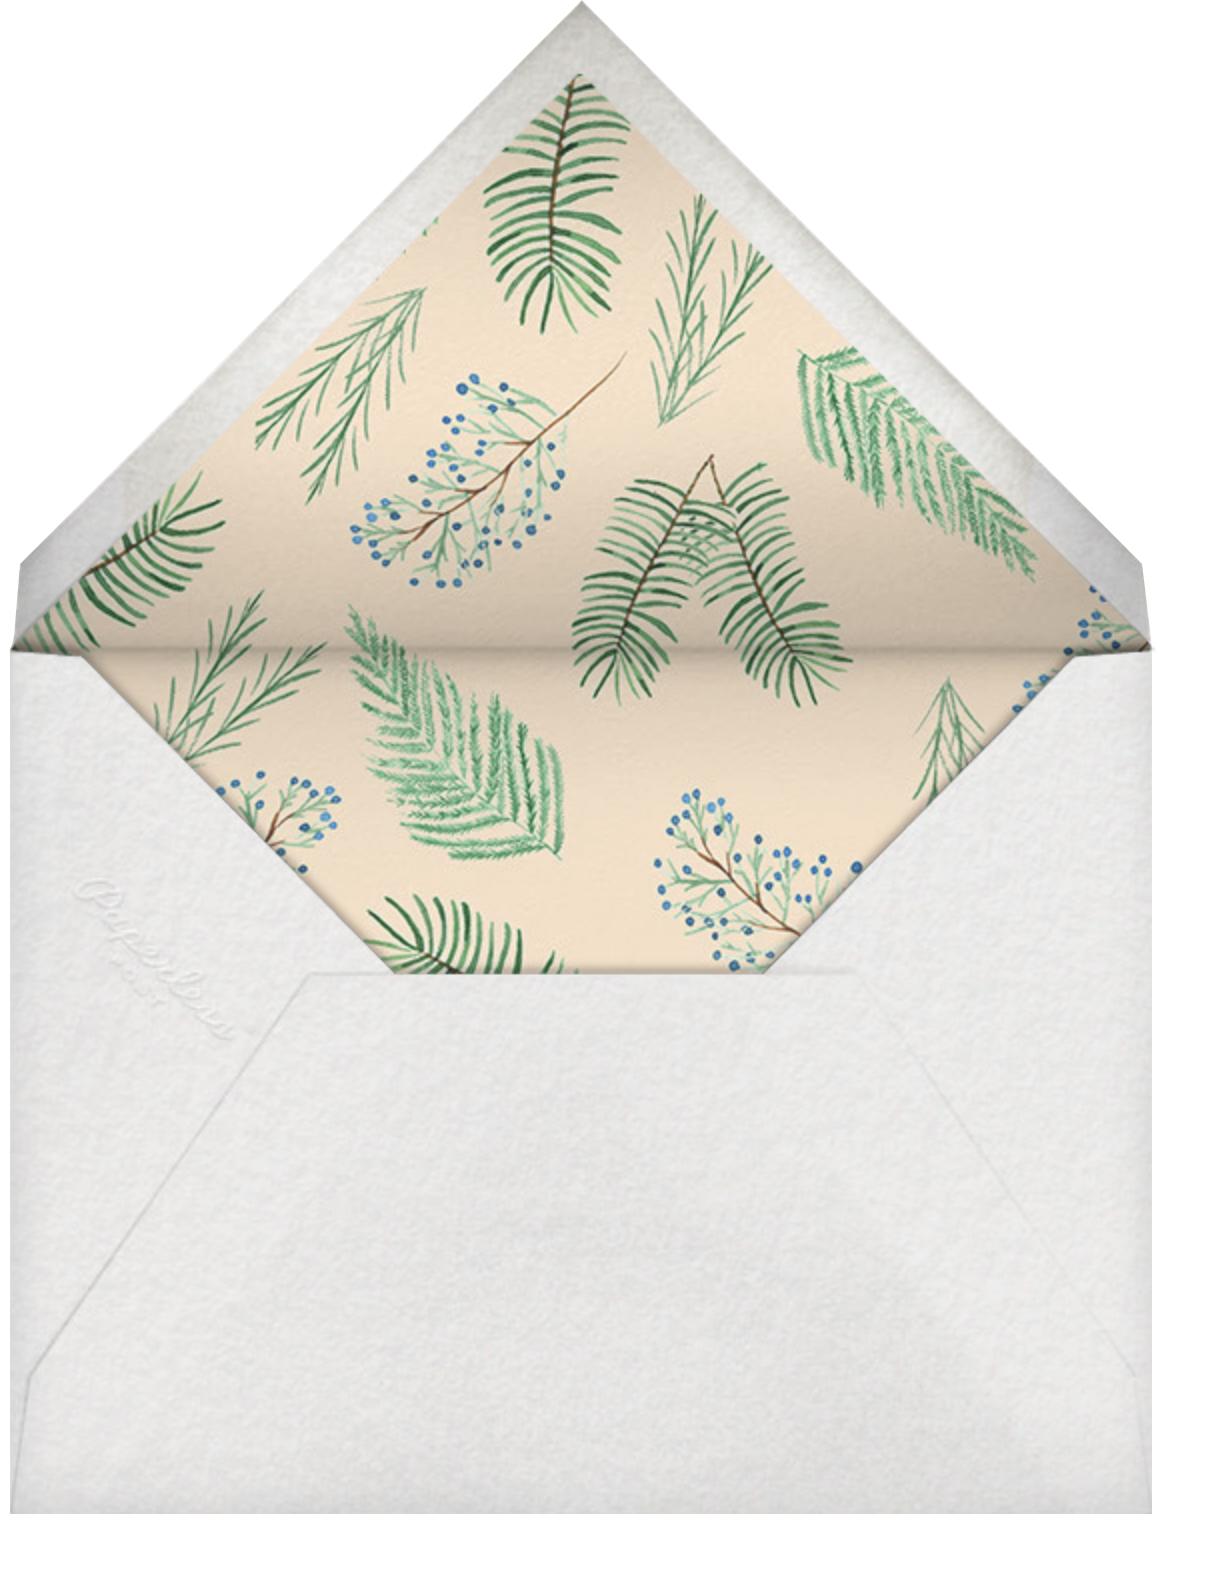 Juniper and Pine - Paperless Post - Winter entertaining - envelope back